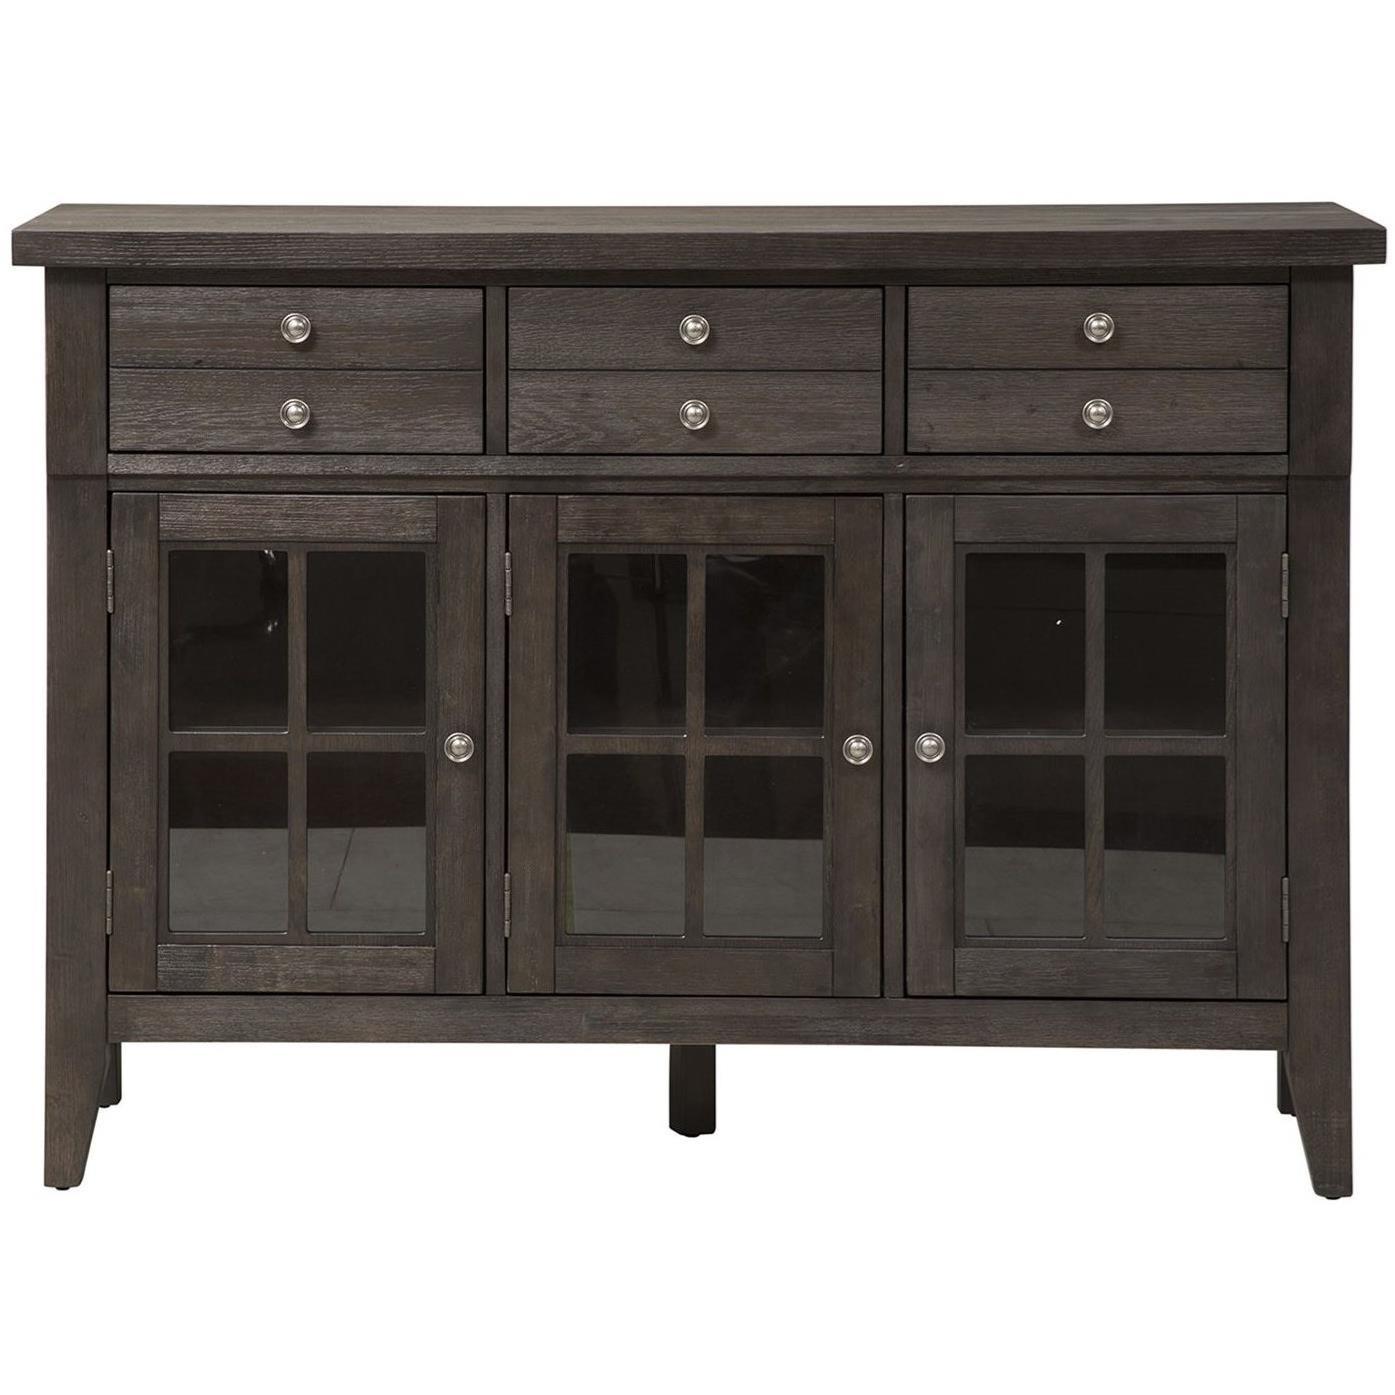 Atwood Creek Buffet by Liberty Furniture at Lapeer Furniture & Mattress Center